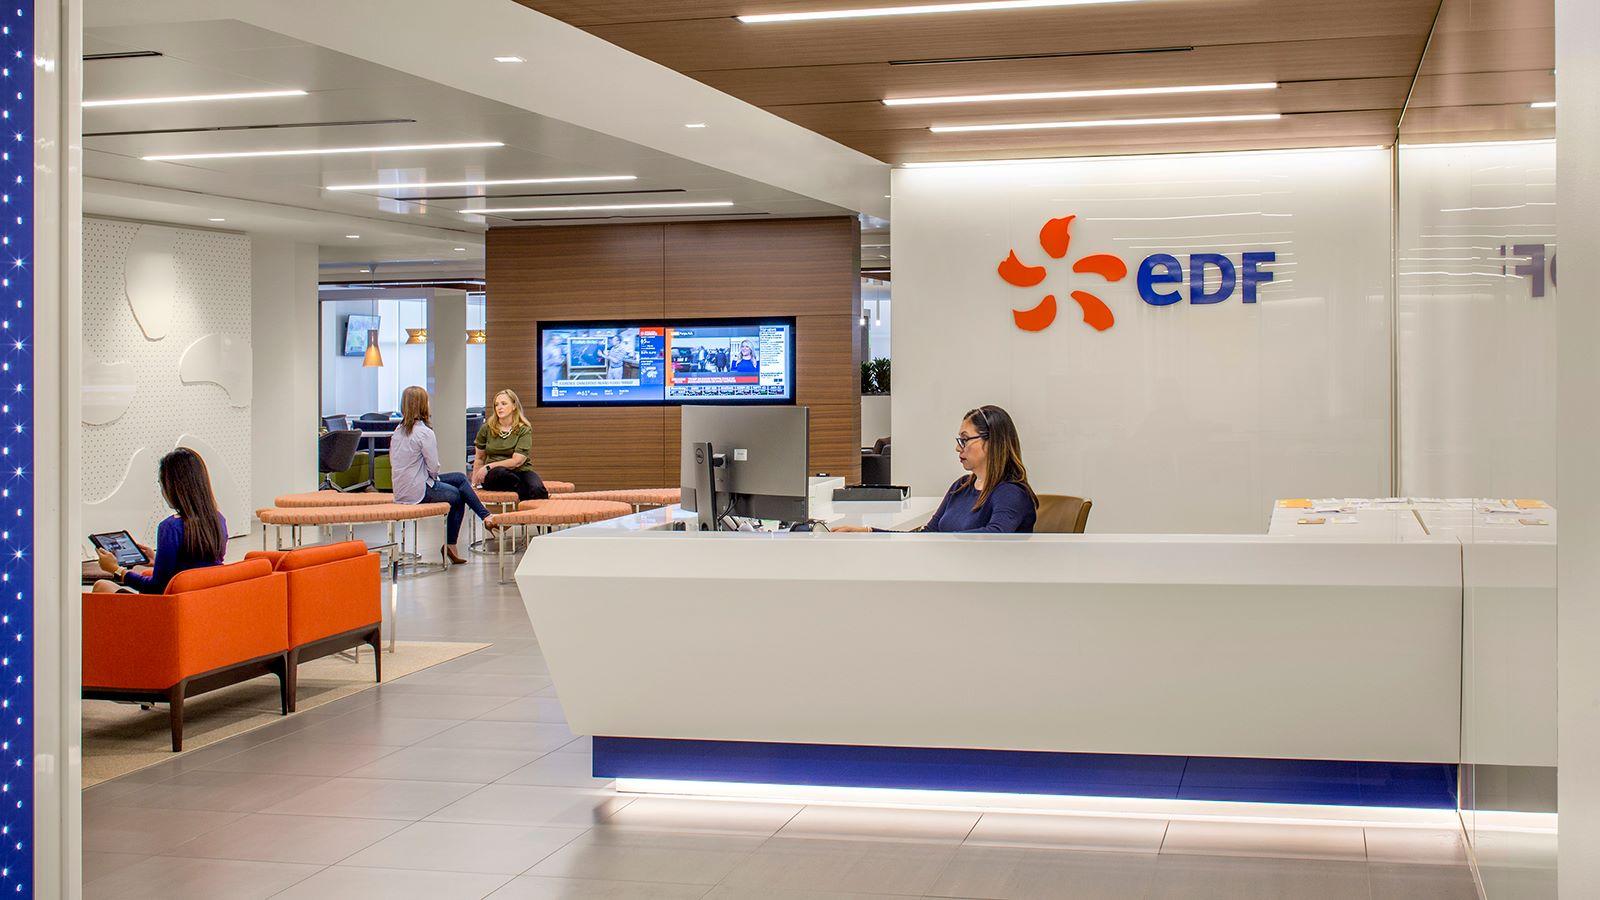 EDF Houston Building Reception Desk - Mace Group